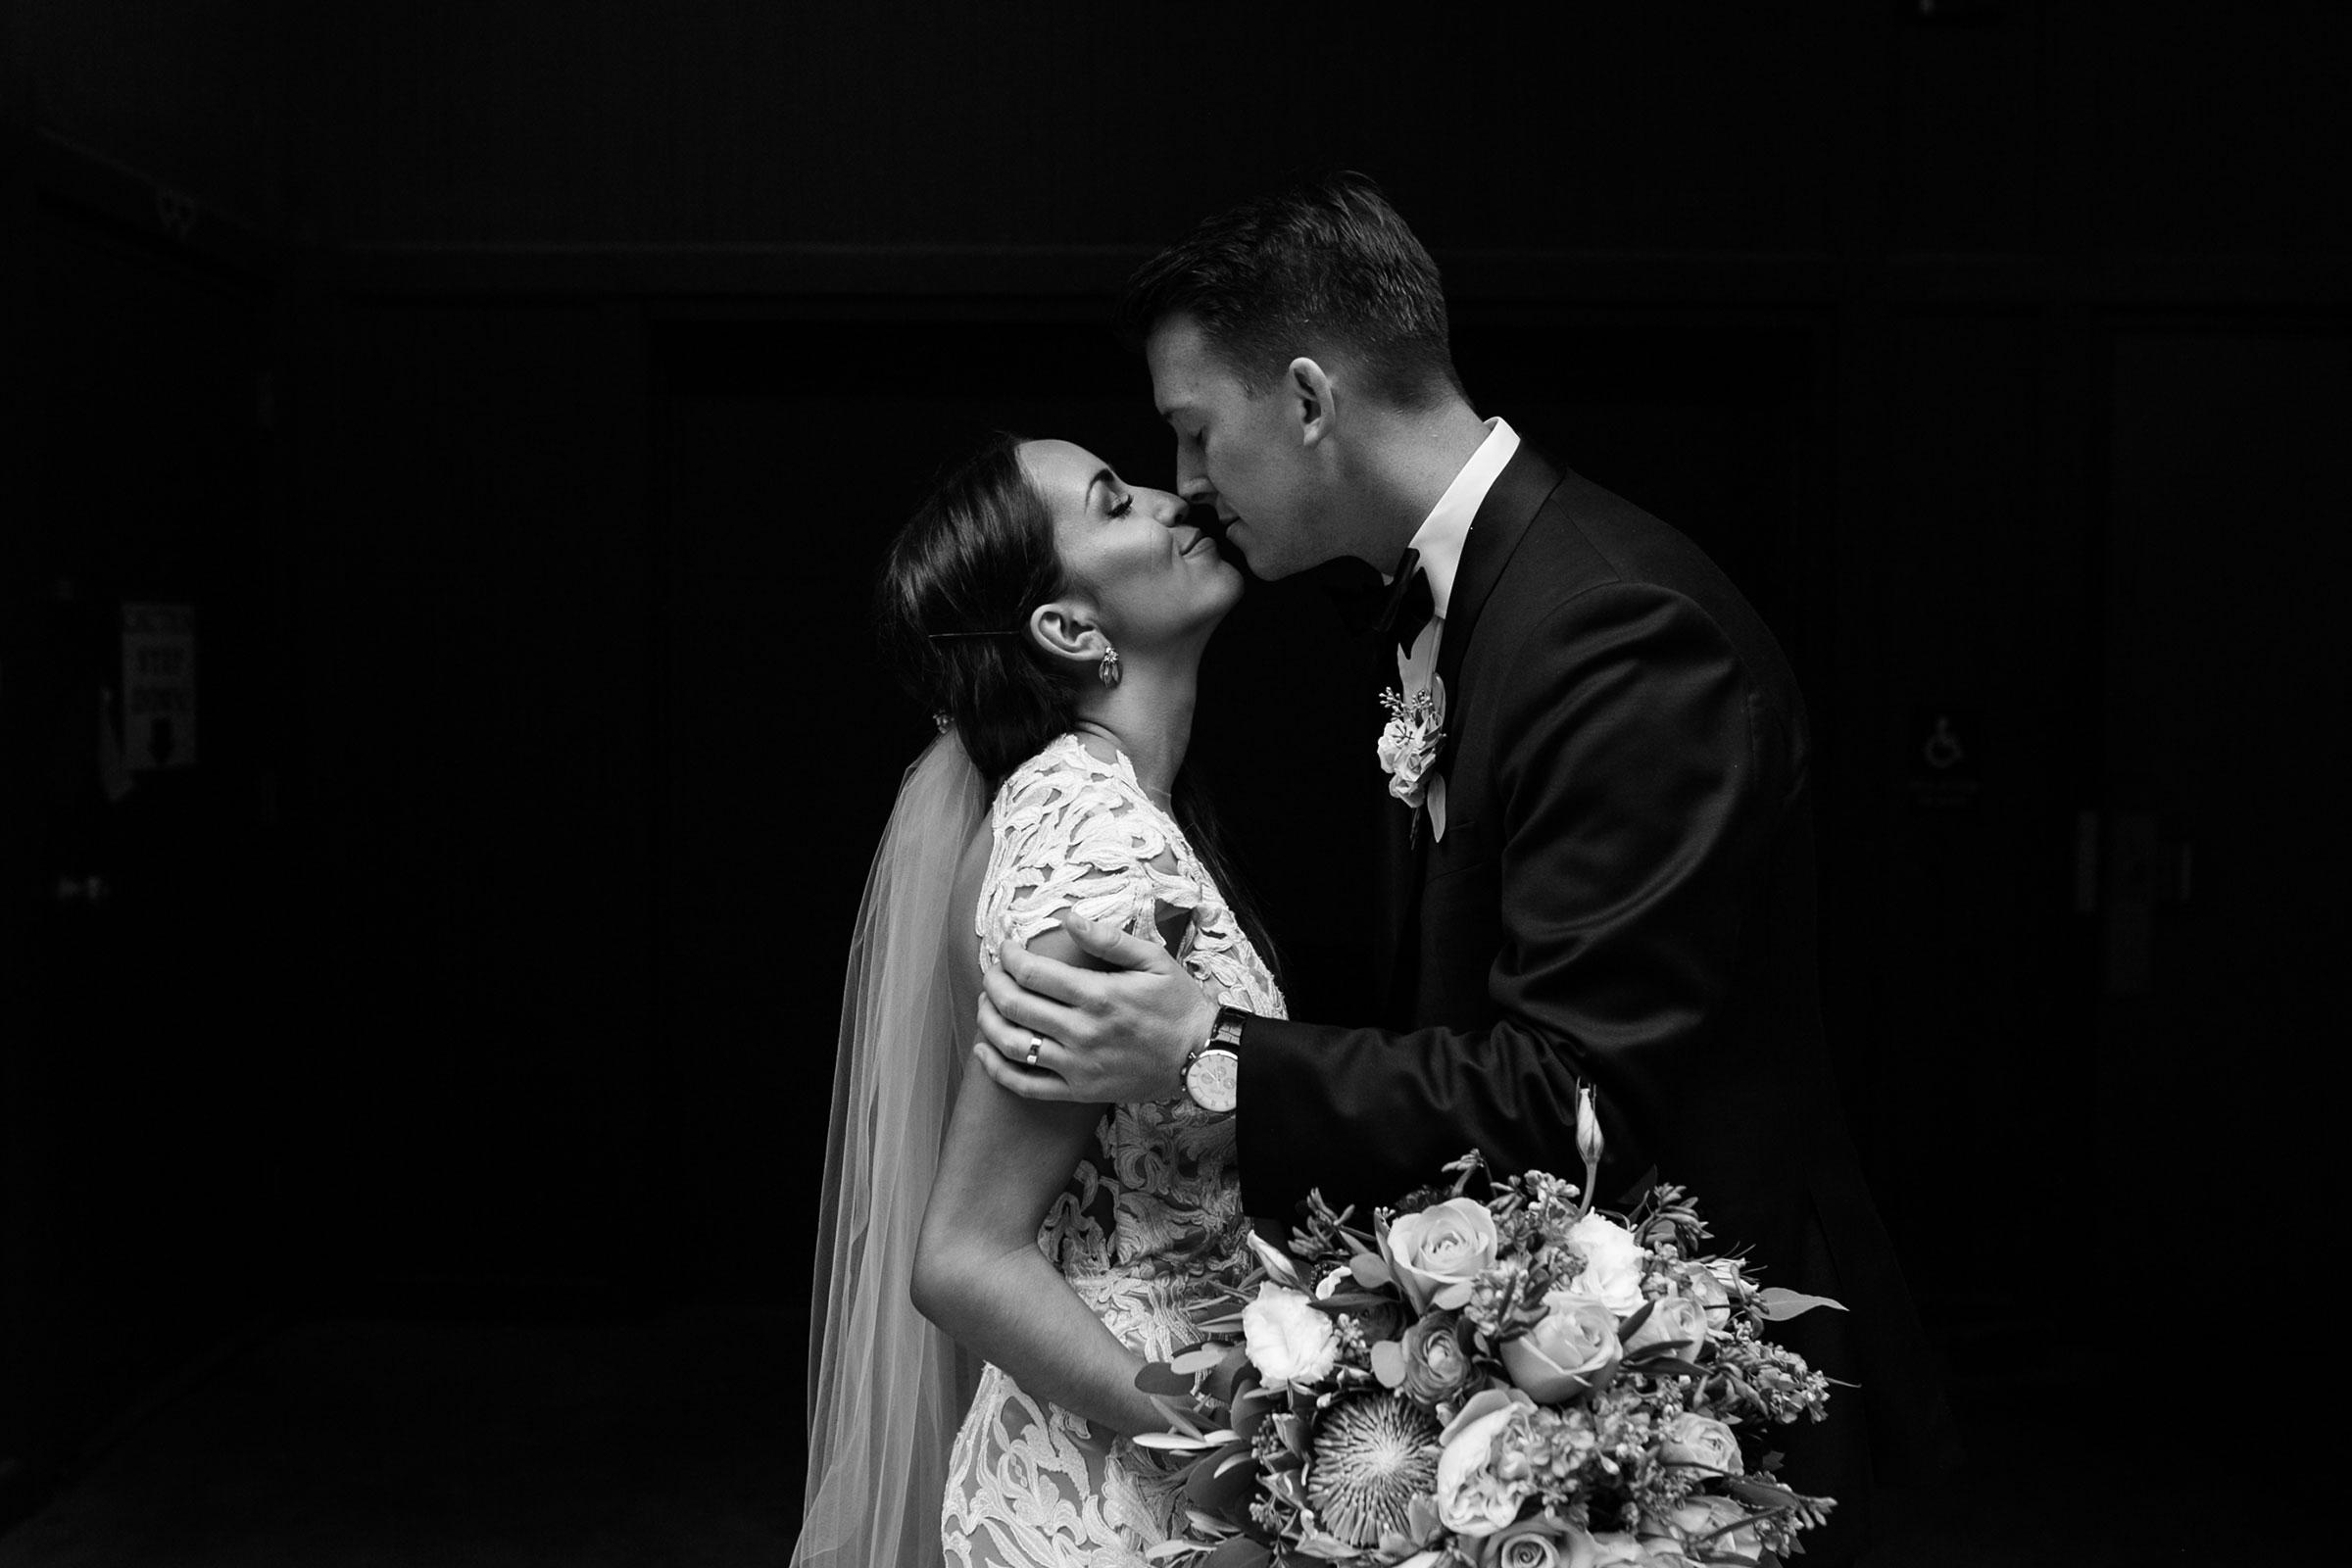 bride-groom-almost-kissing-downtown-omaha-nebraska-raelyn-ramey-photography.jpg